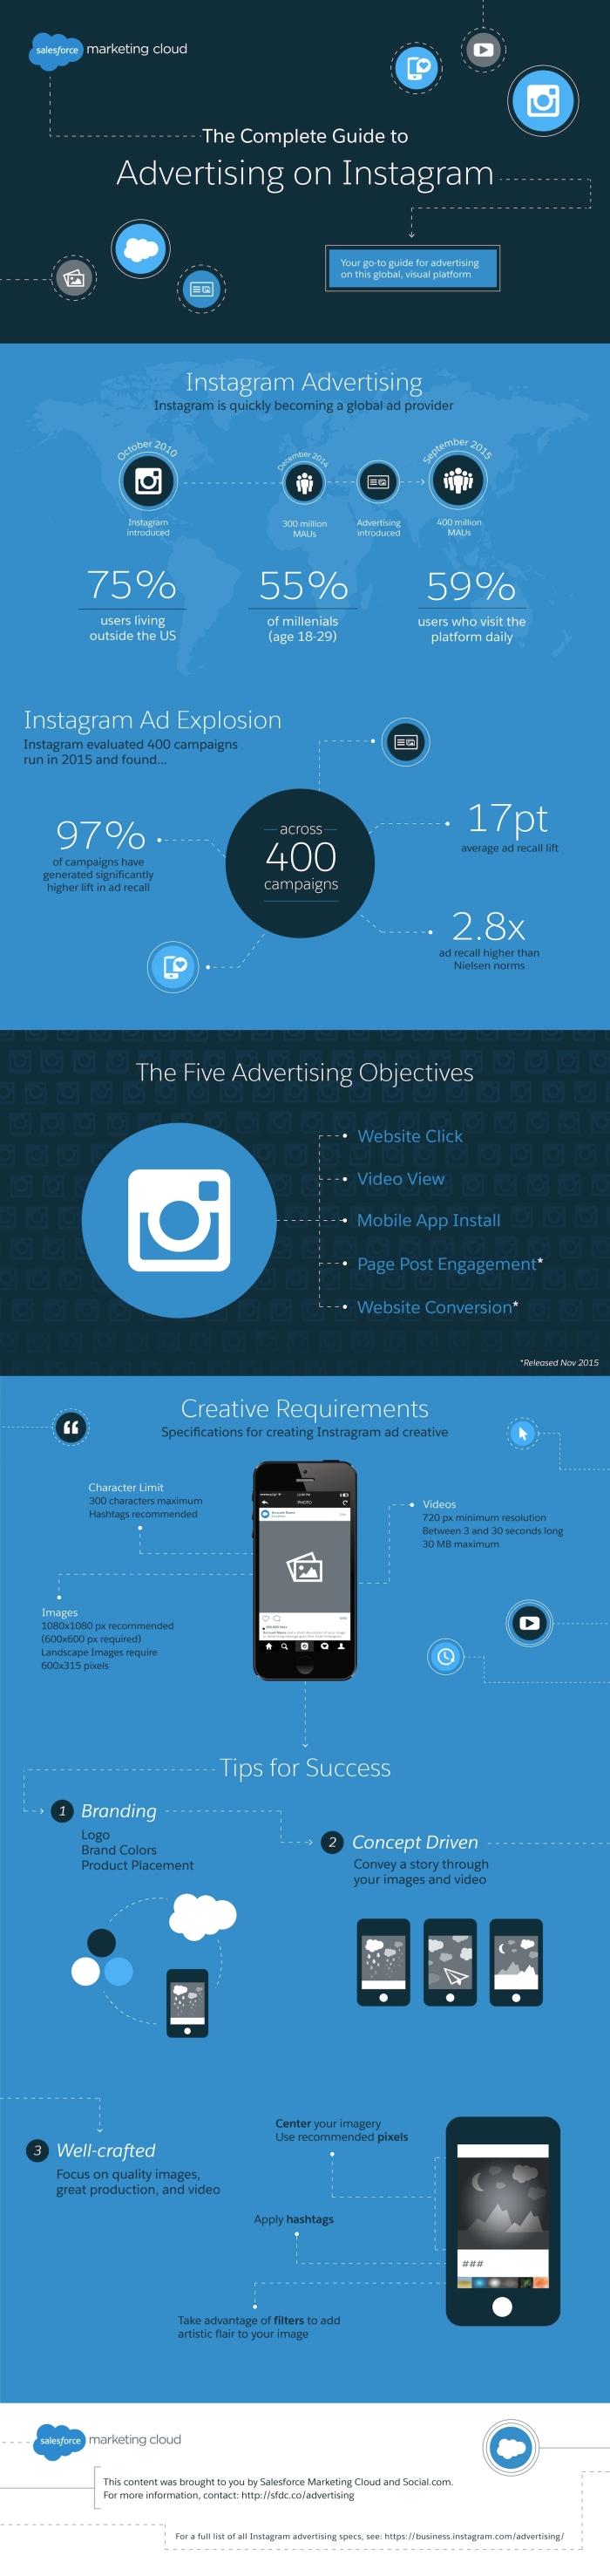 salesforce_IG_infographic